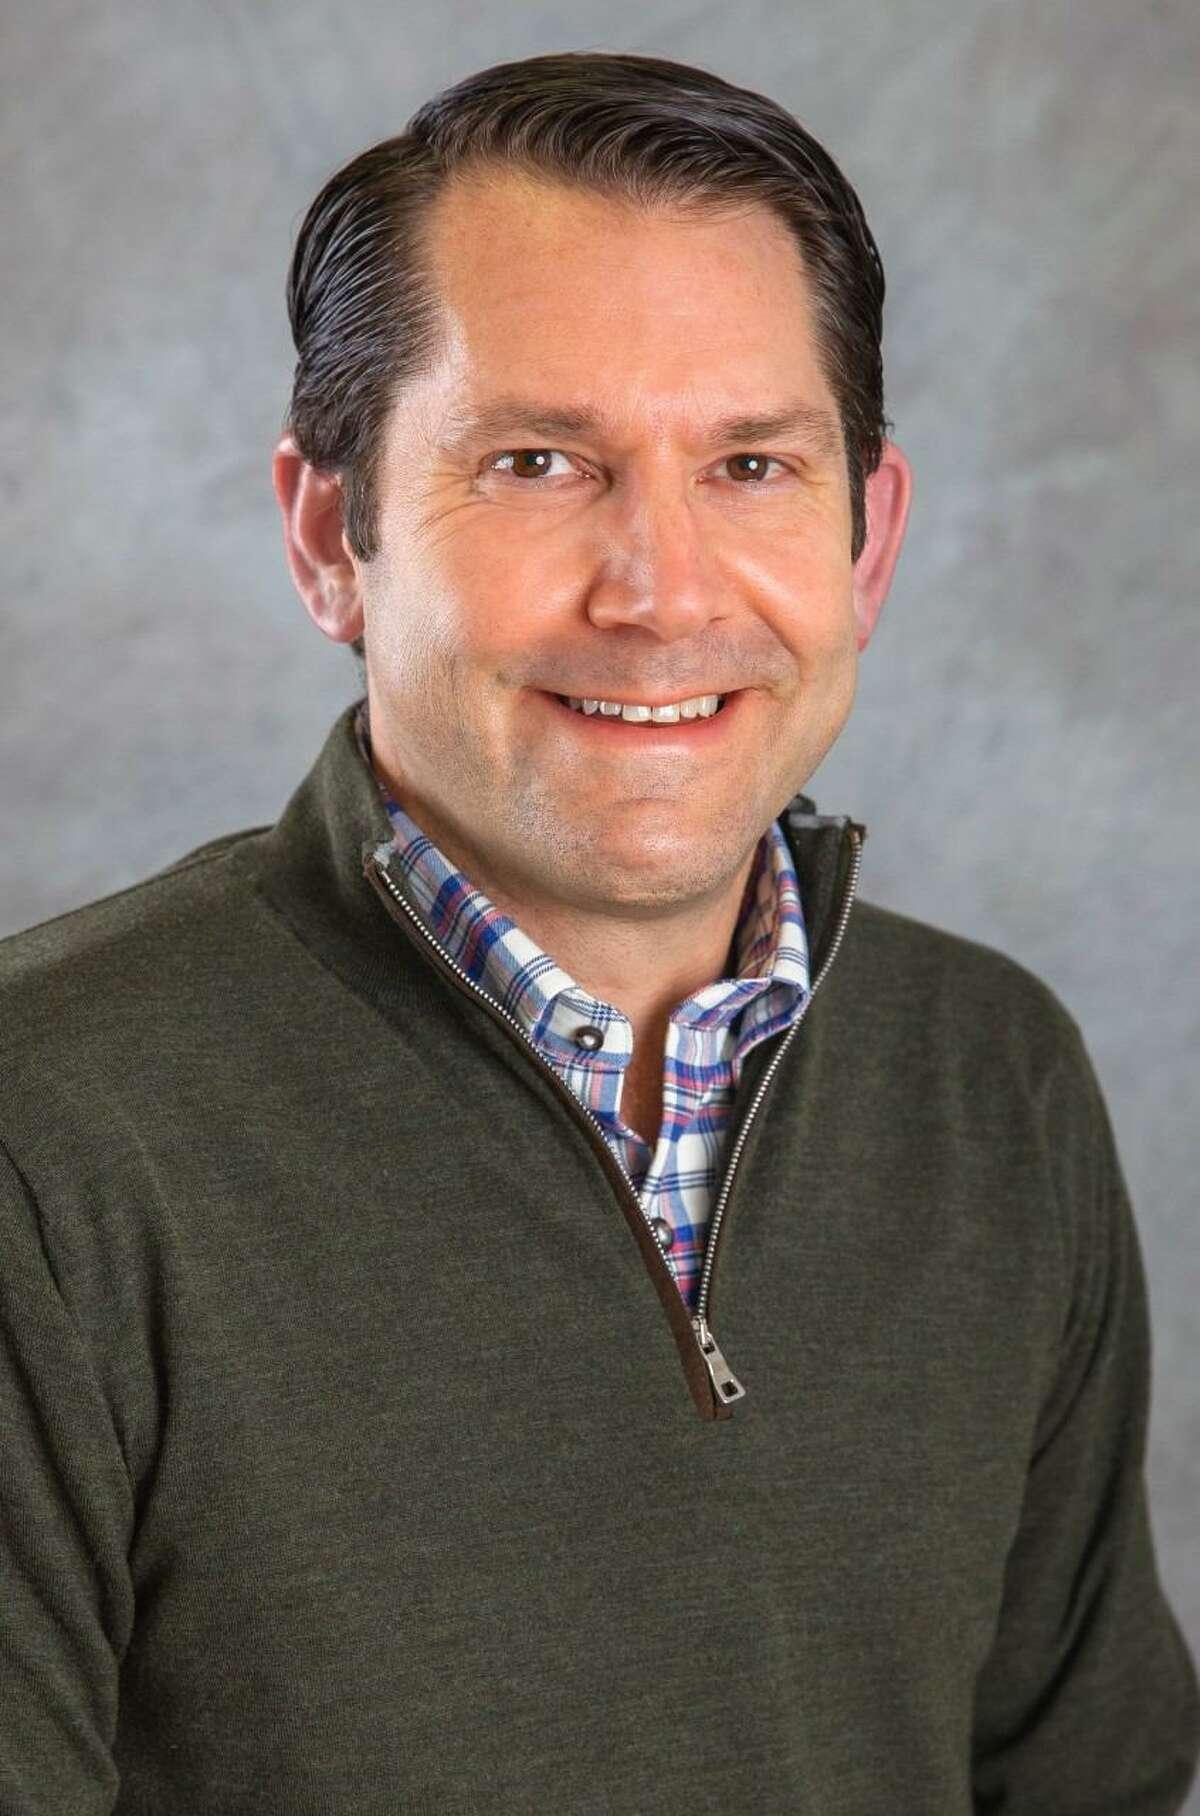 Brian Lawlor